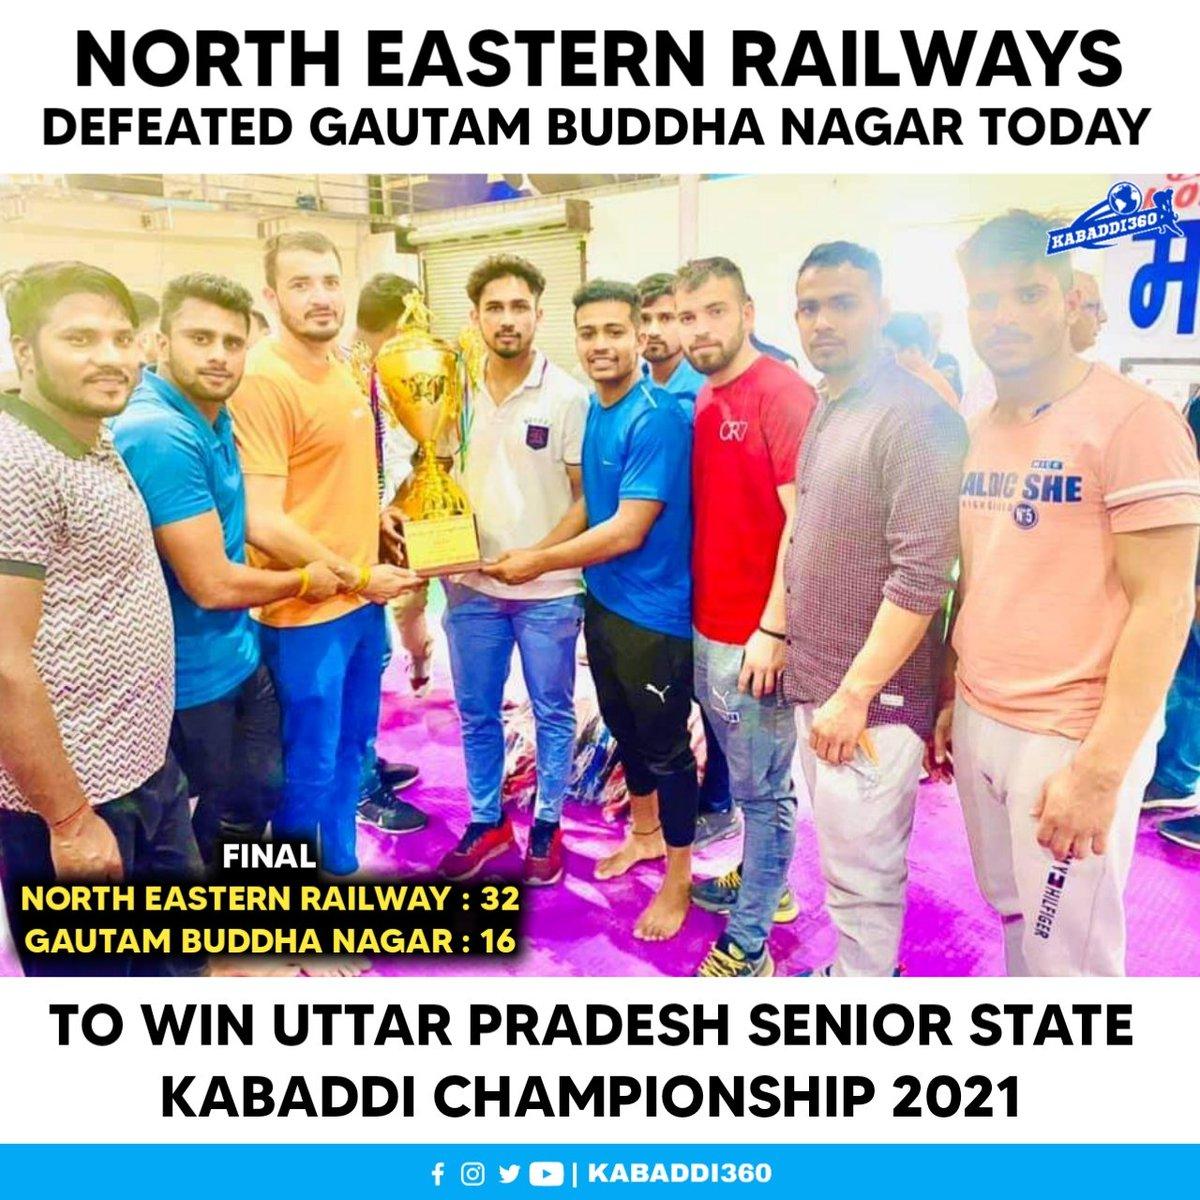 The likes of Sunil Kumar, Parvesh Bhainswal & Amit Nagar featured for the winning NER team 🎉 Congratulations!   #UttarPradeshKabaddi #StateChampionships #KabaddiResults #Kabaddi360